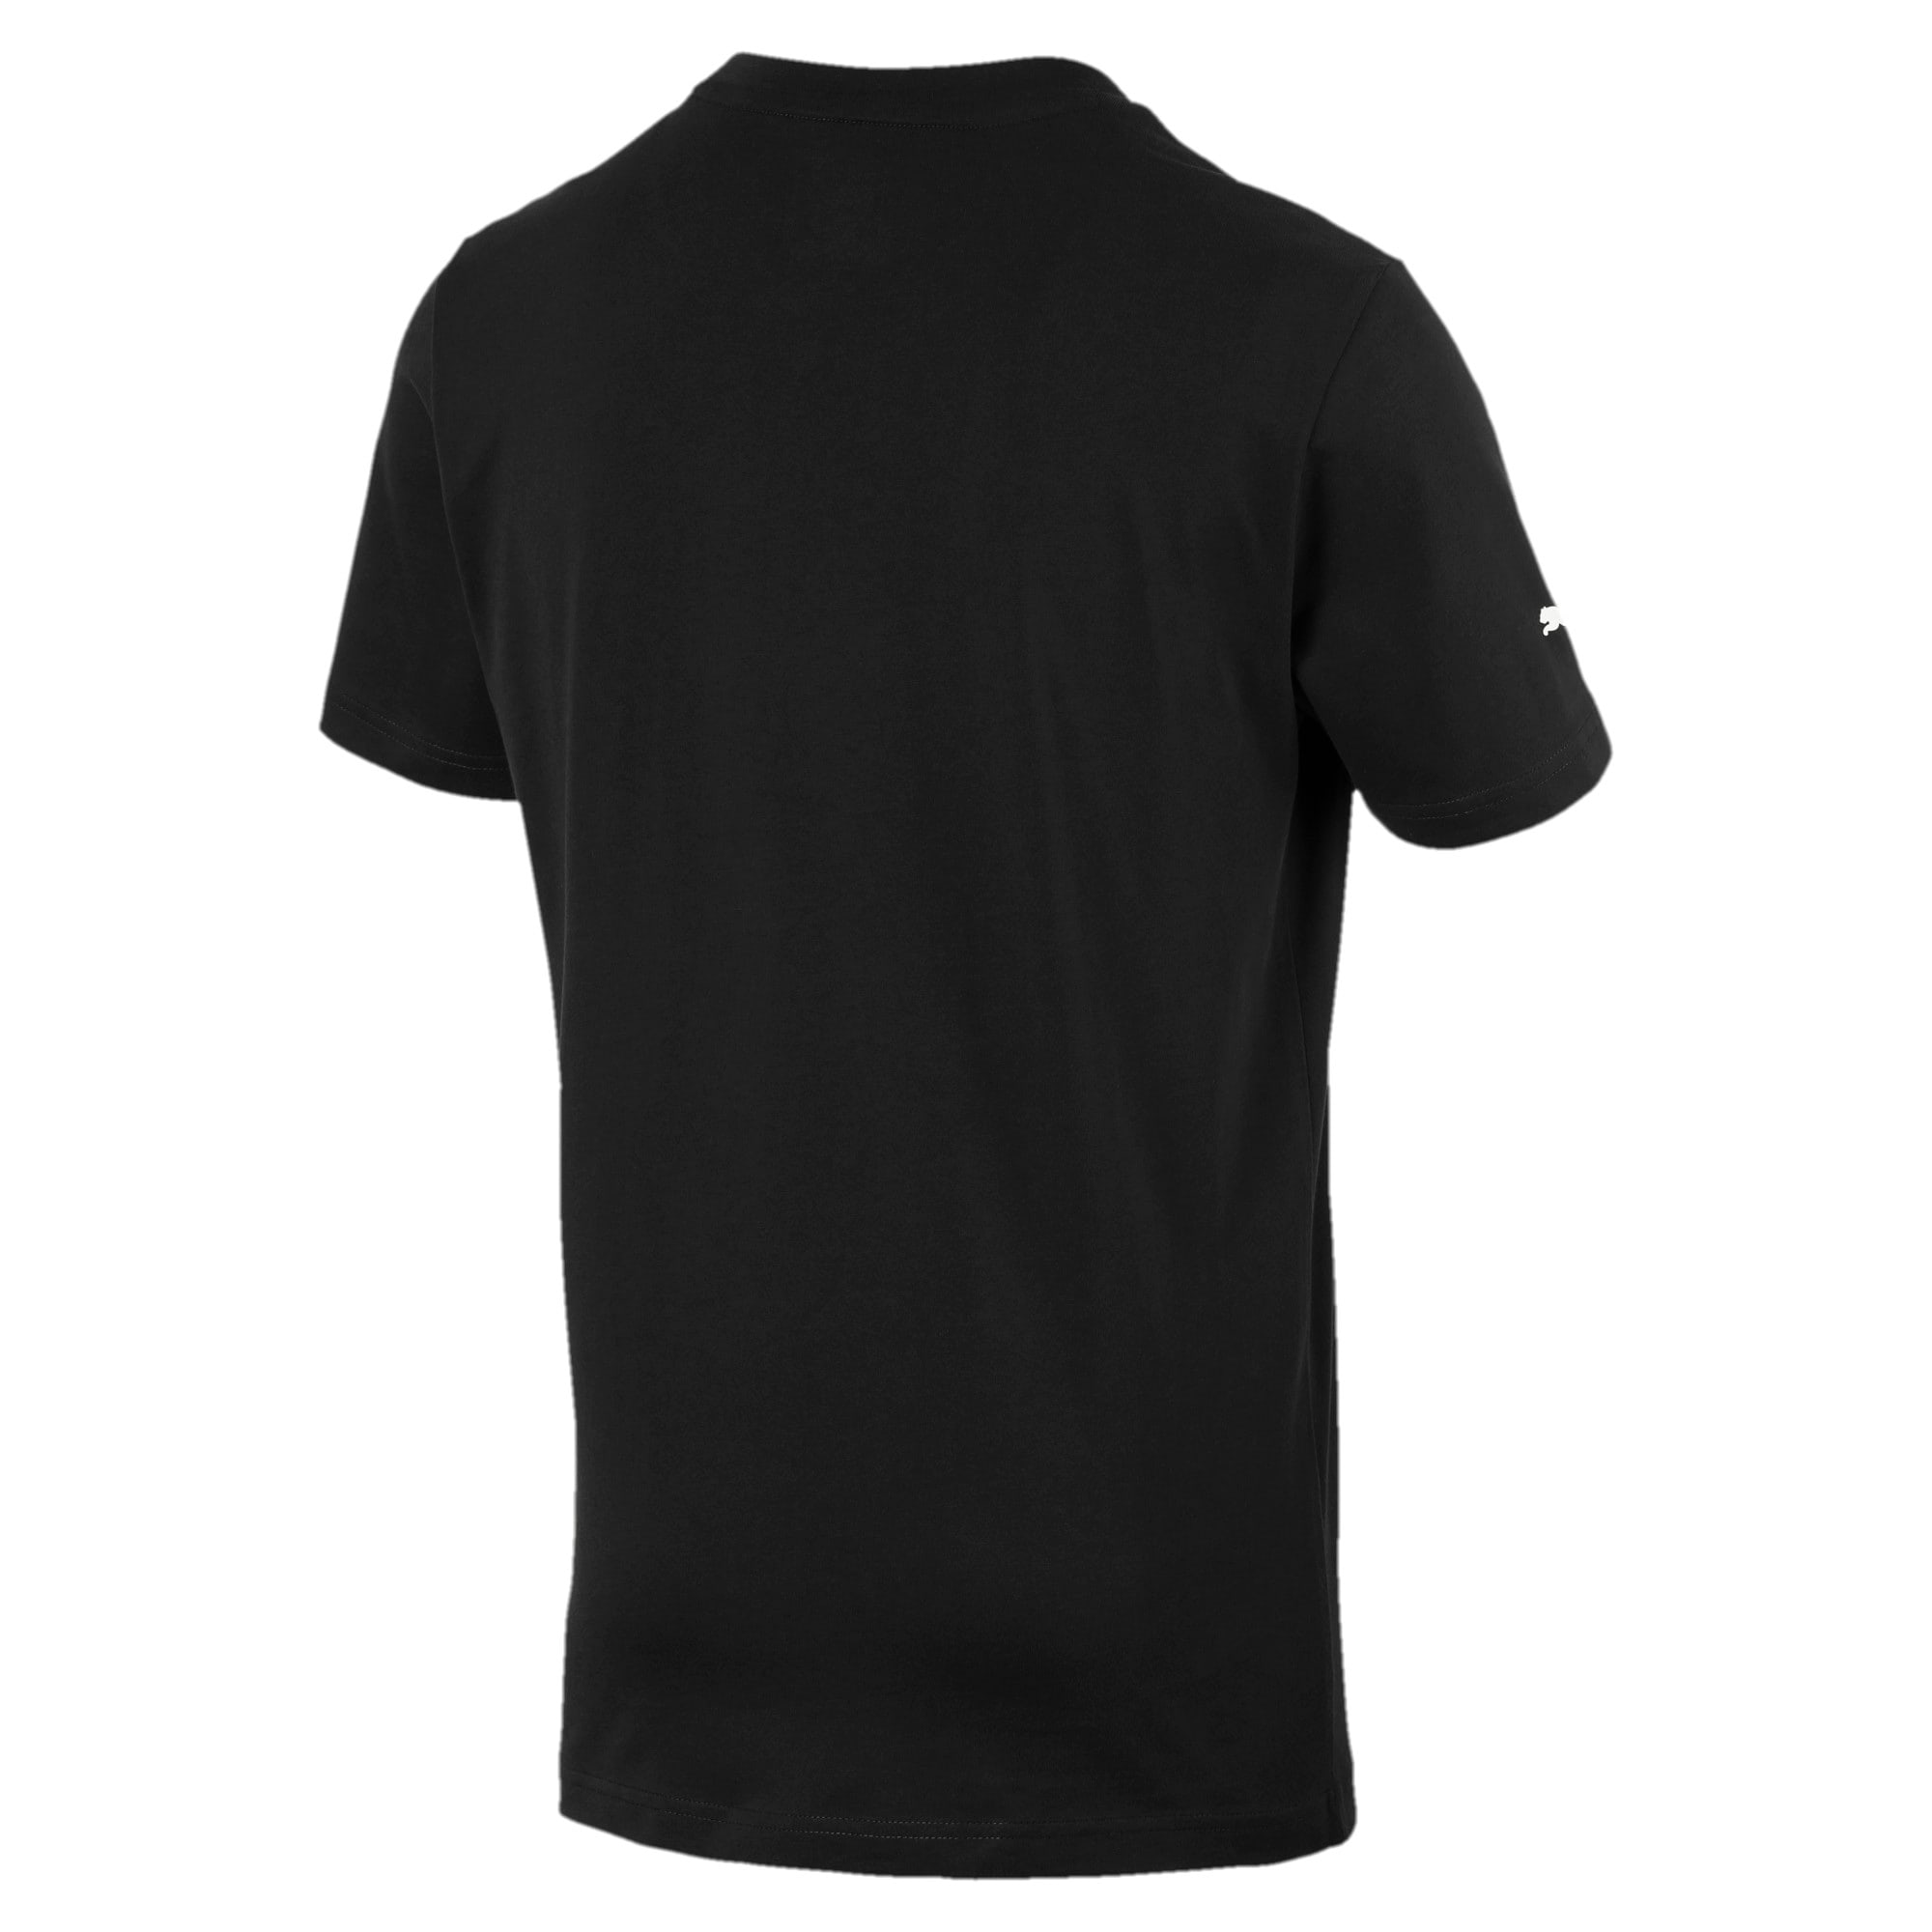 Thumbnail 3 of フェラーリ ビッグシールド Tシャツ + 半袖, Puma Black, medium-JPN